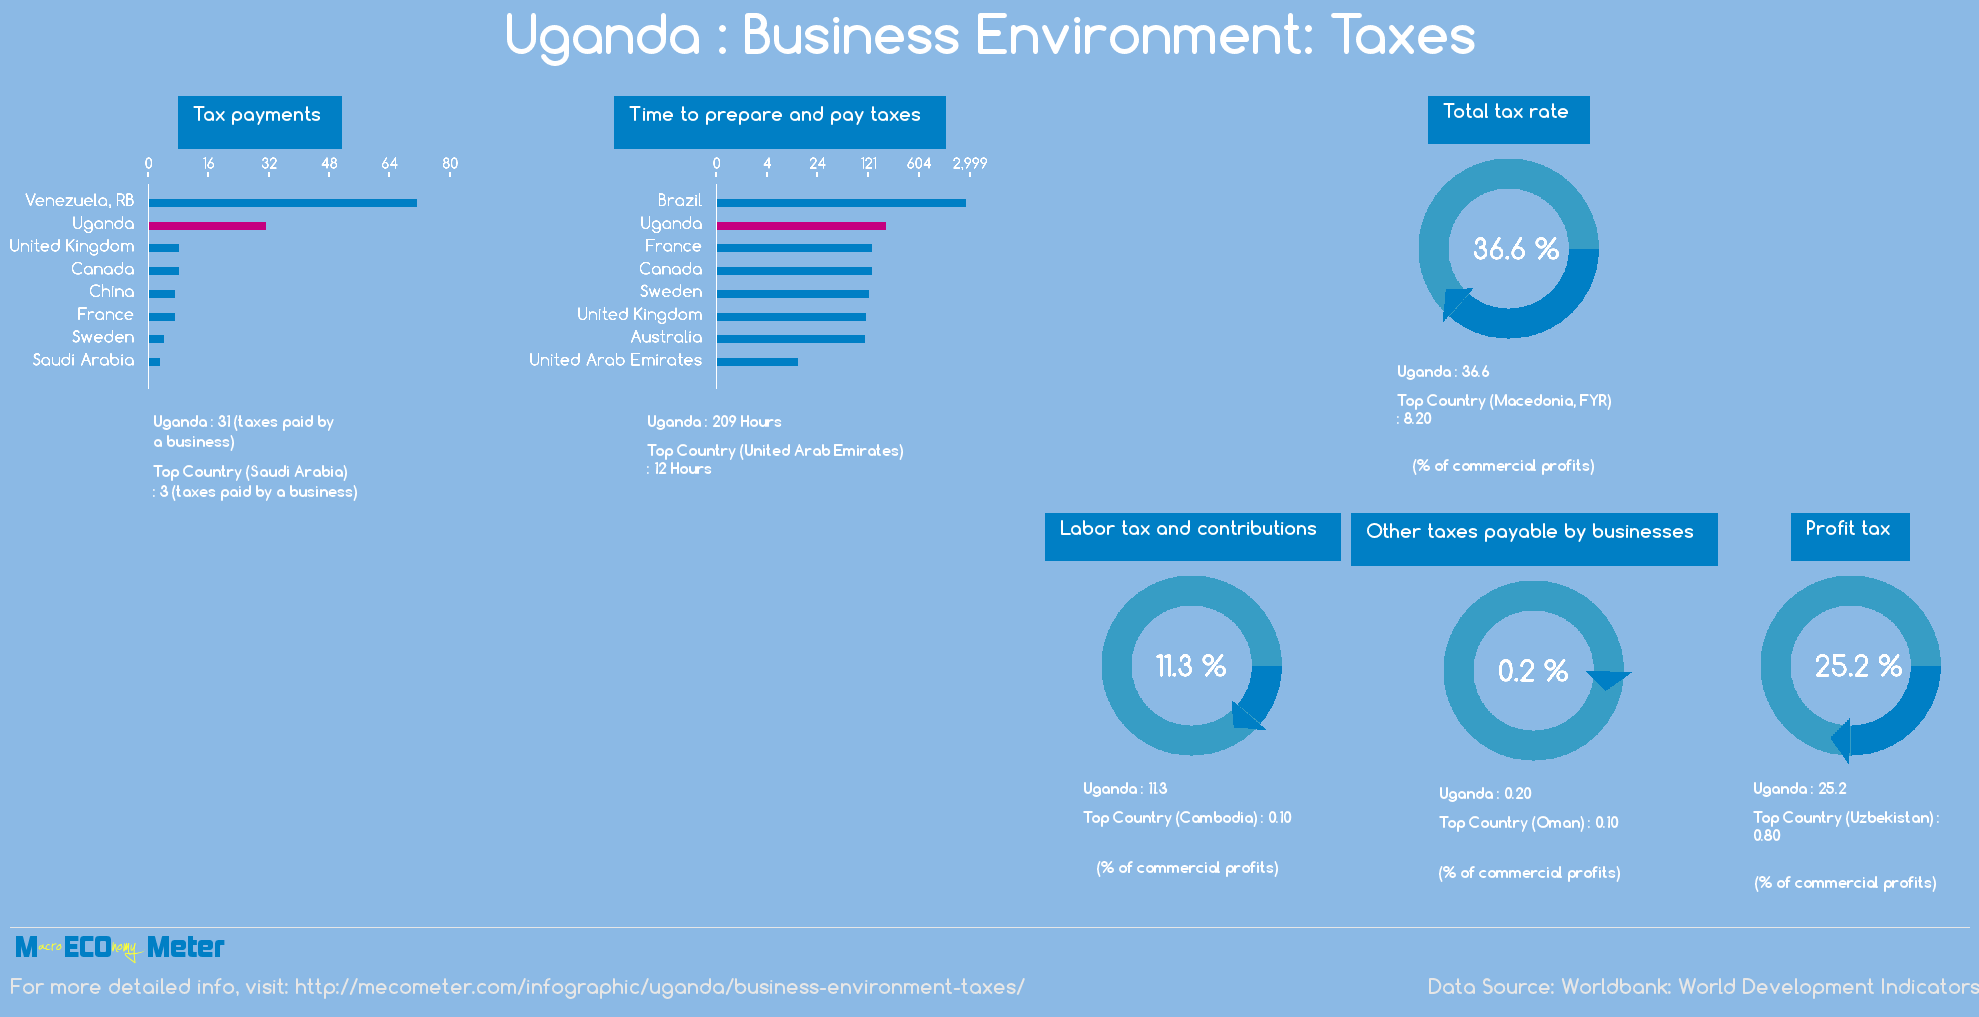 Uganda : Business Environment: Taxes